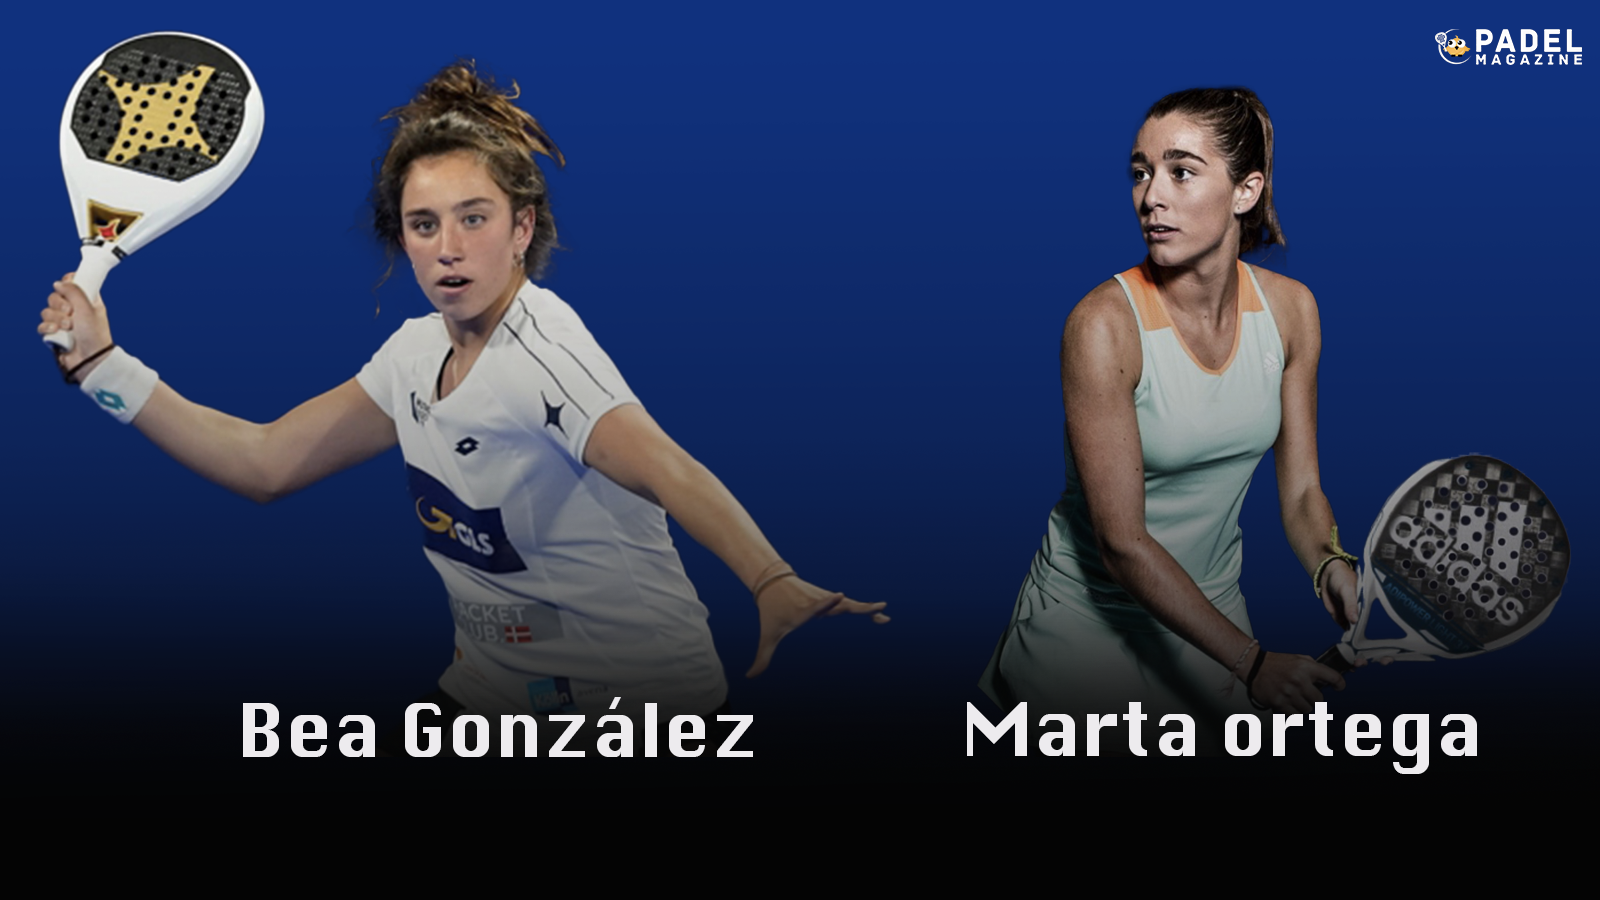 Ufficiale: Marta Ortega e Bea Gonzalez tornano insieme